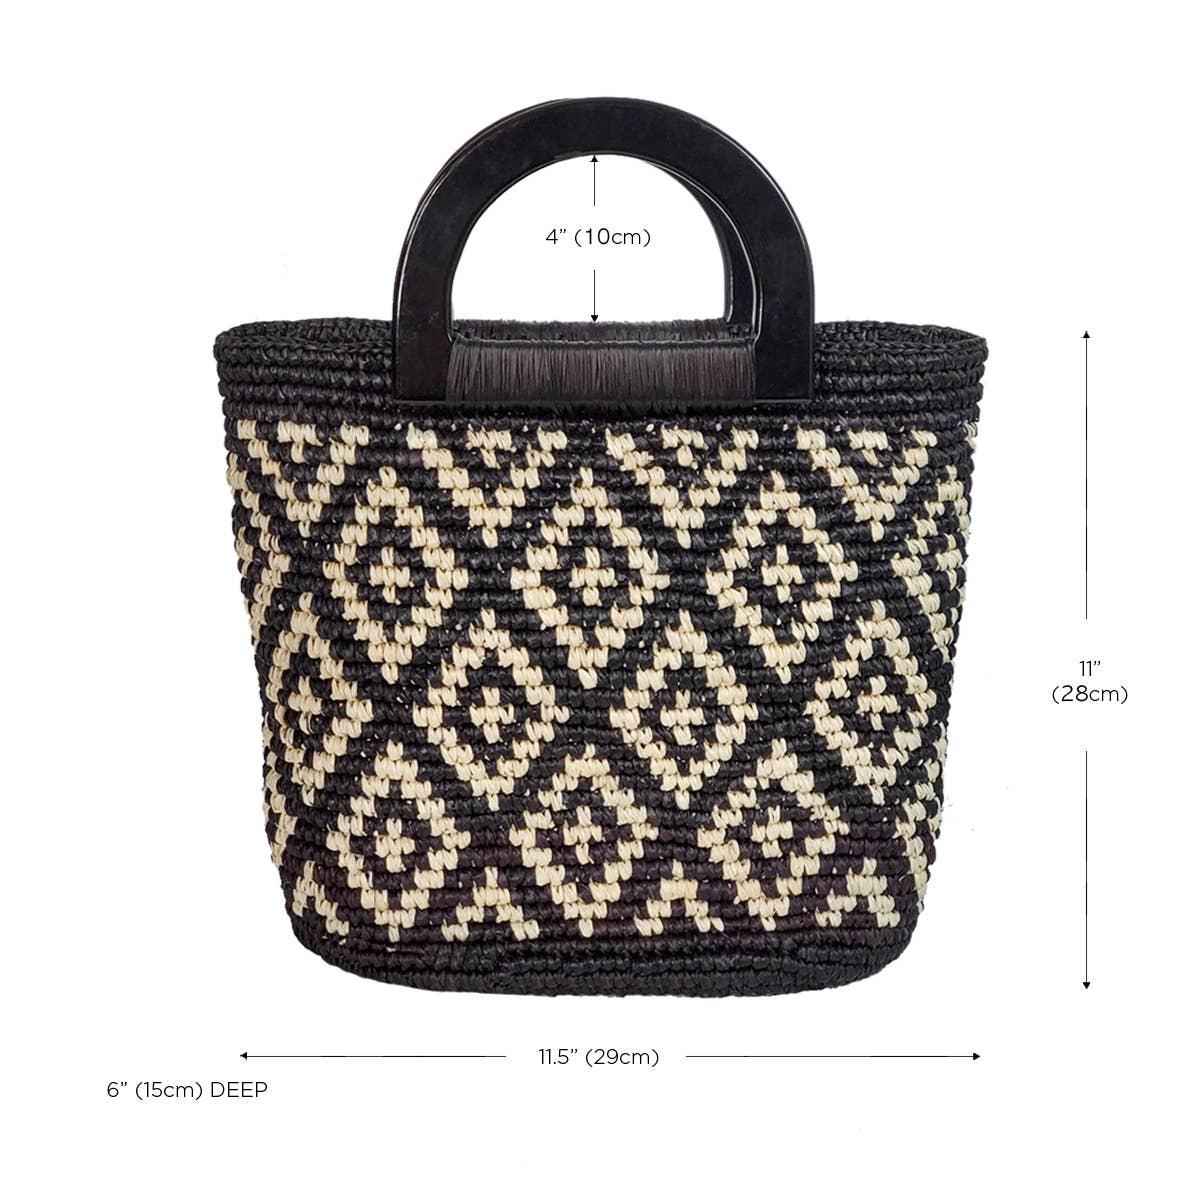 Diamente Tote Bag   Trada Marketplace